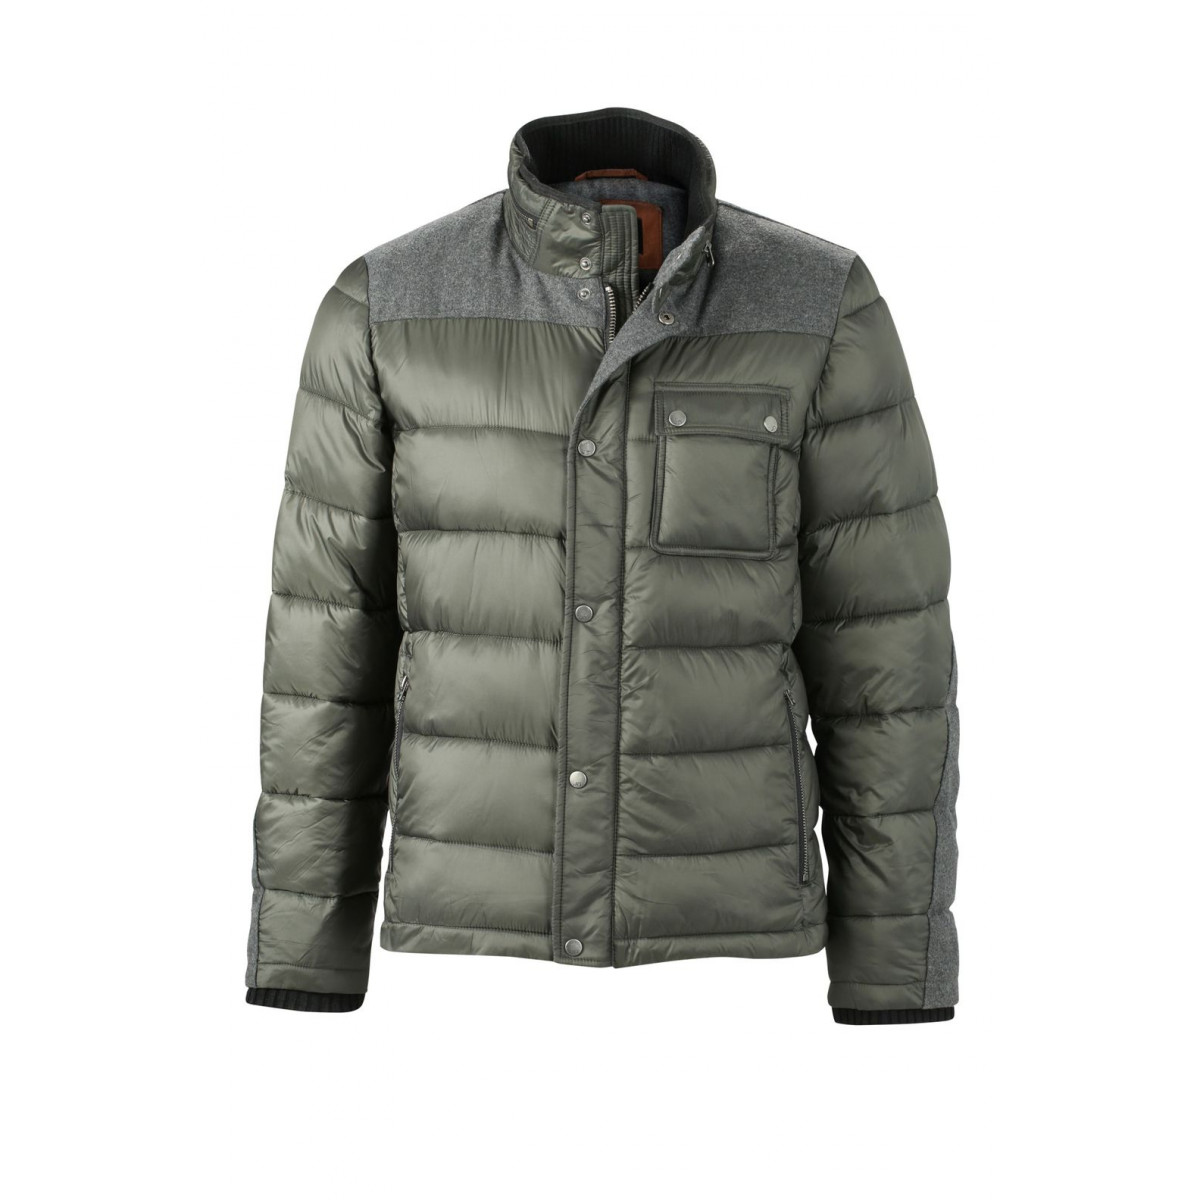 Куртка мужская JN1100 Mens Winter Jacket - Цвет хвои